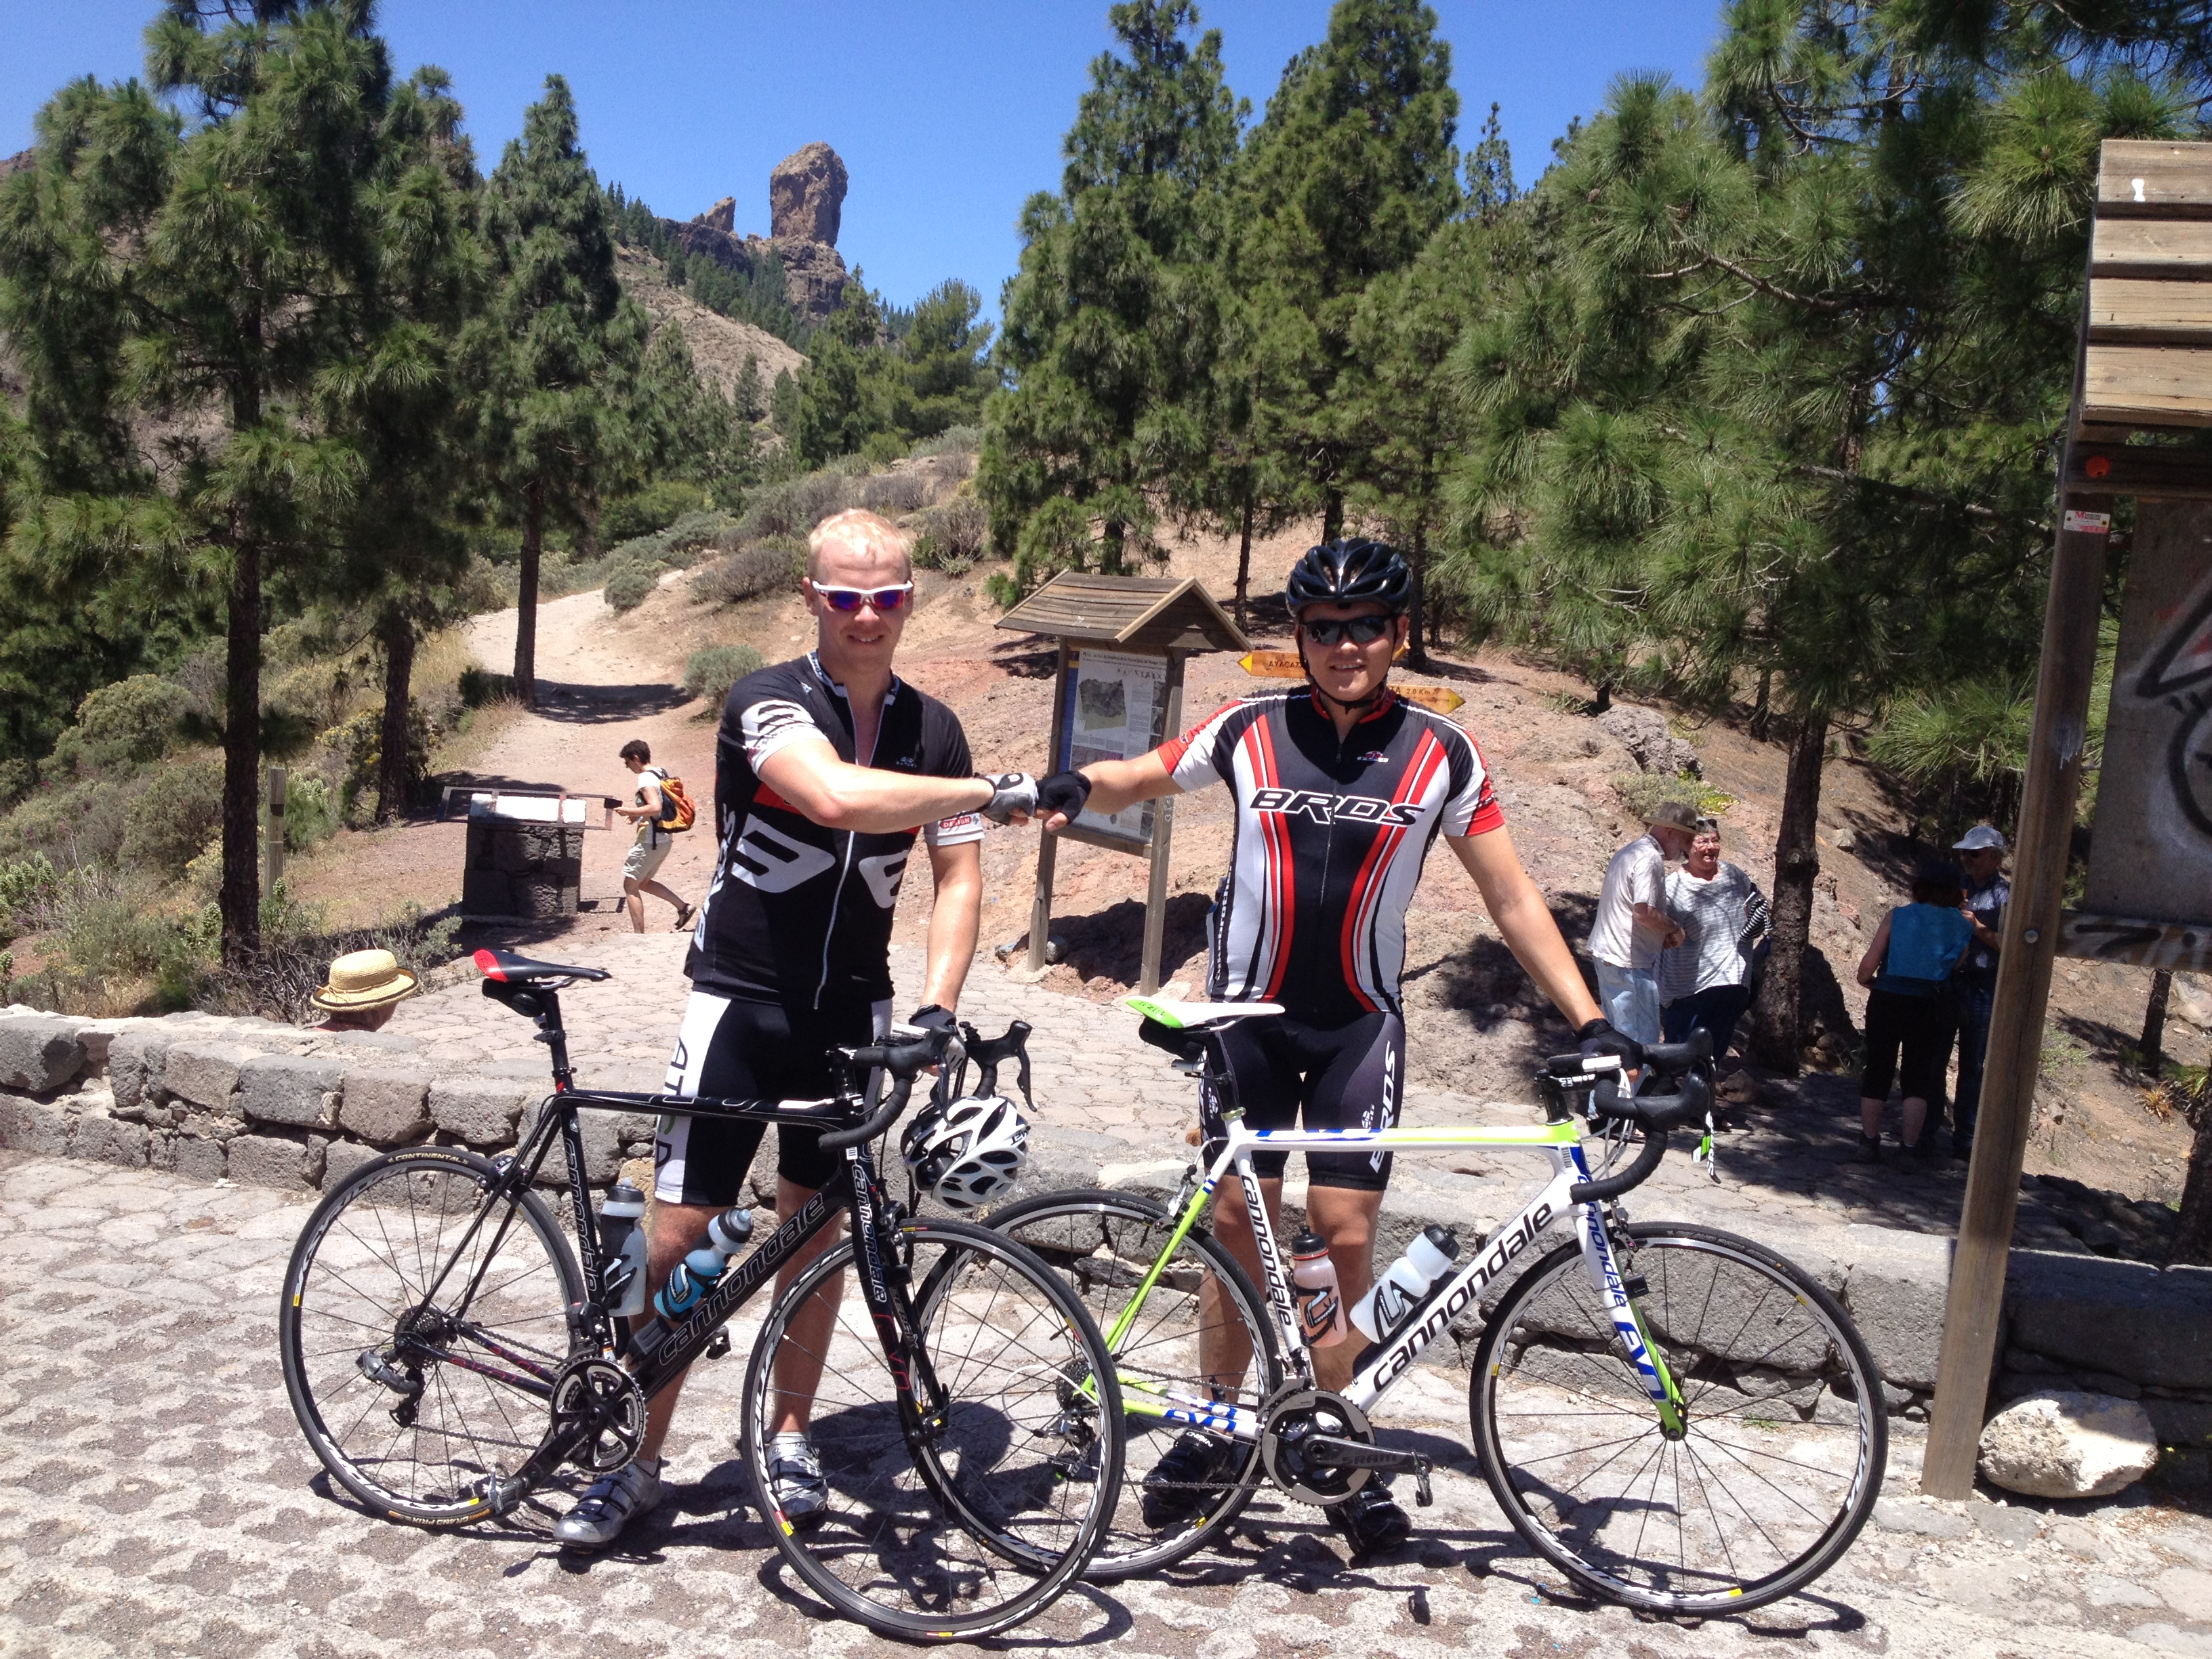 Gran  Canaria  –  Dag  4:  Toppen  av  Gran  Canaria  og  en  fantastisk  dag  på  sykkel